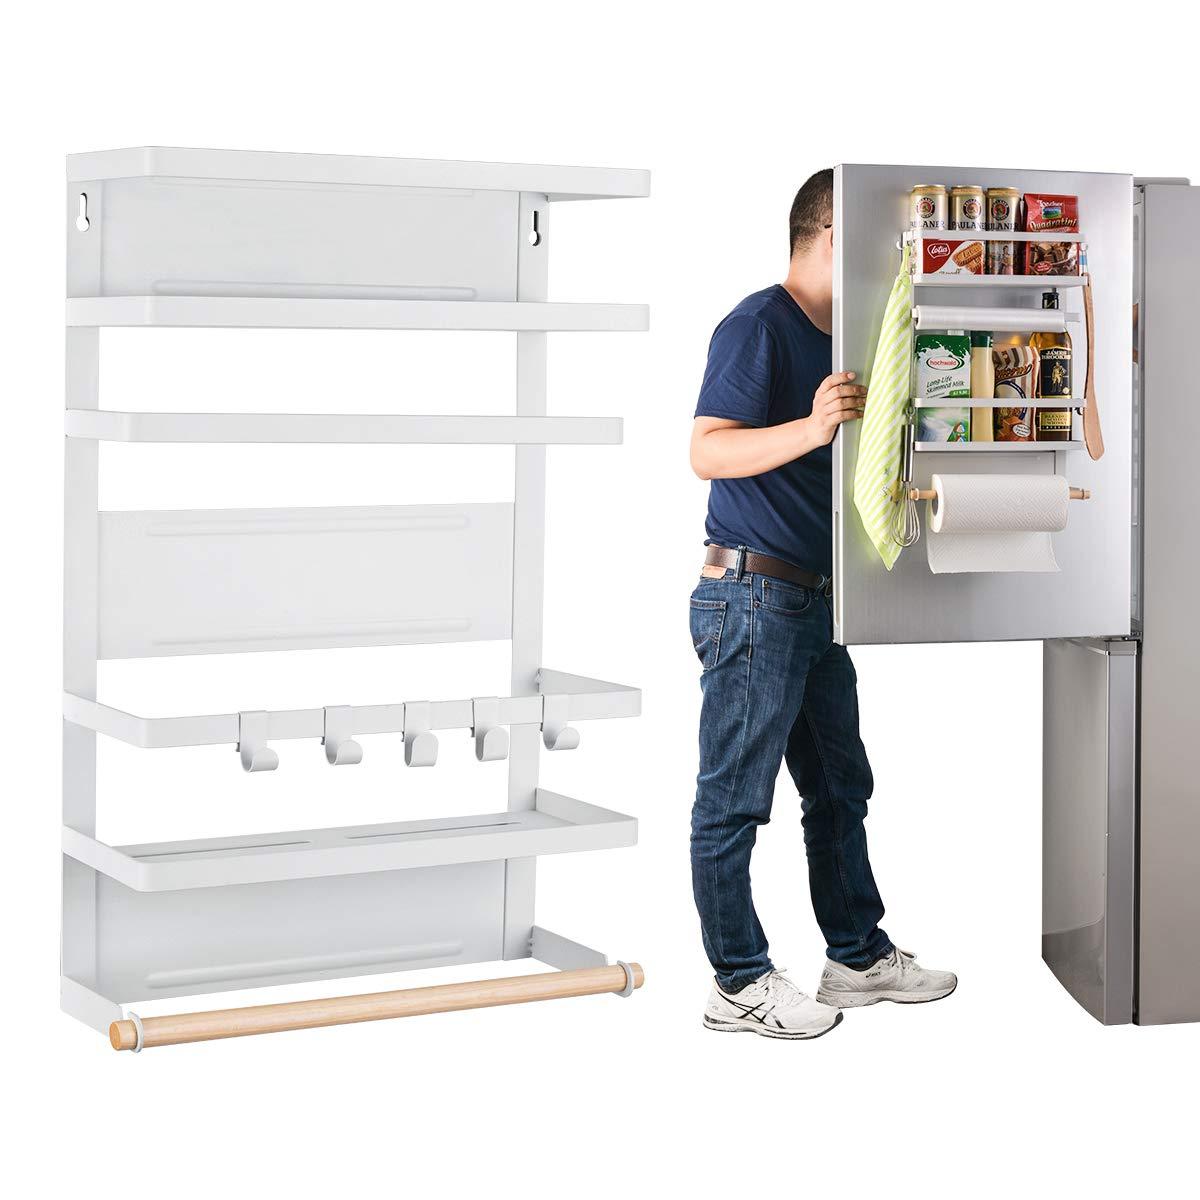 Refrigerator Organizer Rack